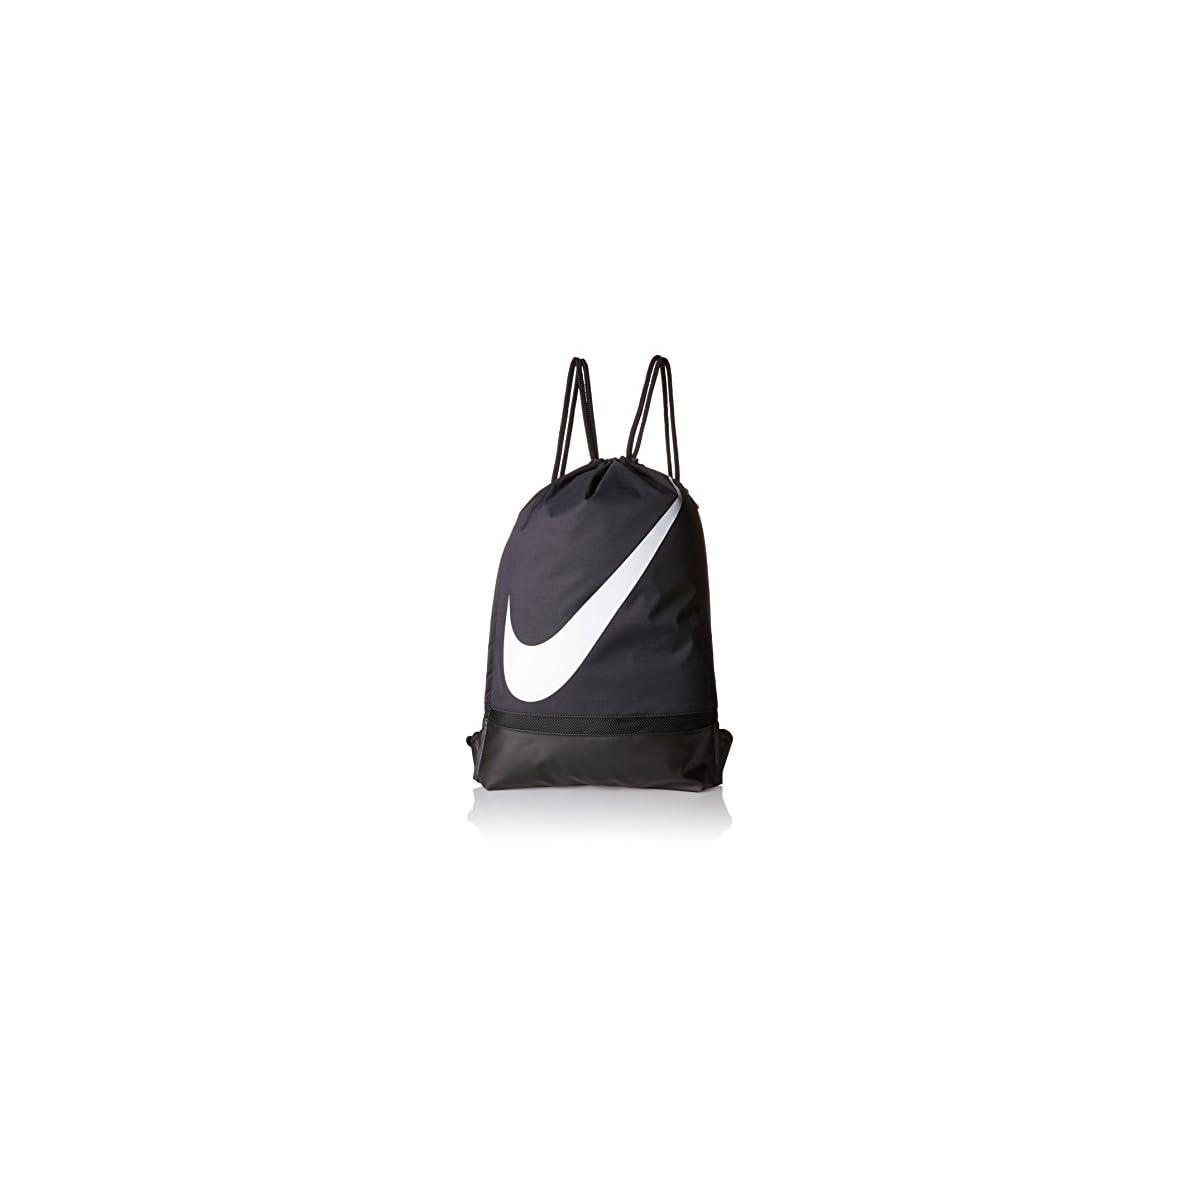 41HlnrMotnL. SS1200  - Nike Gymsack Entrenamiento Bolsa